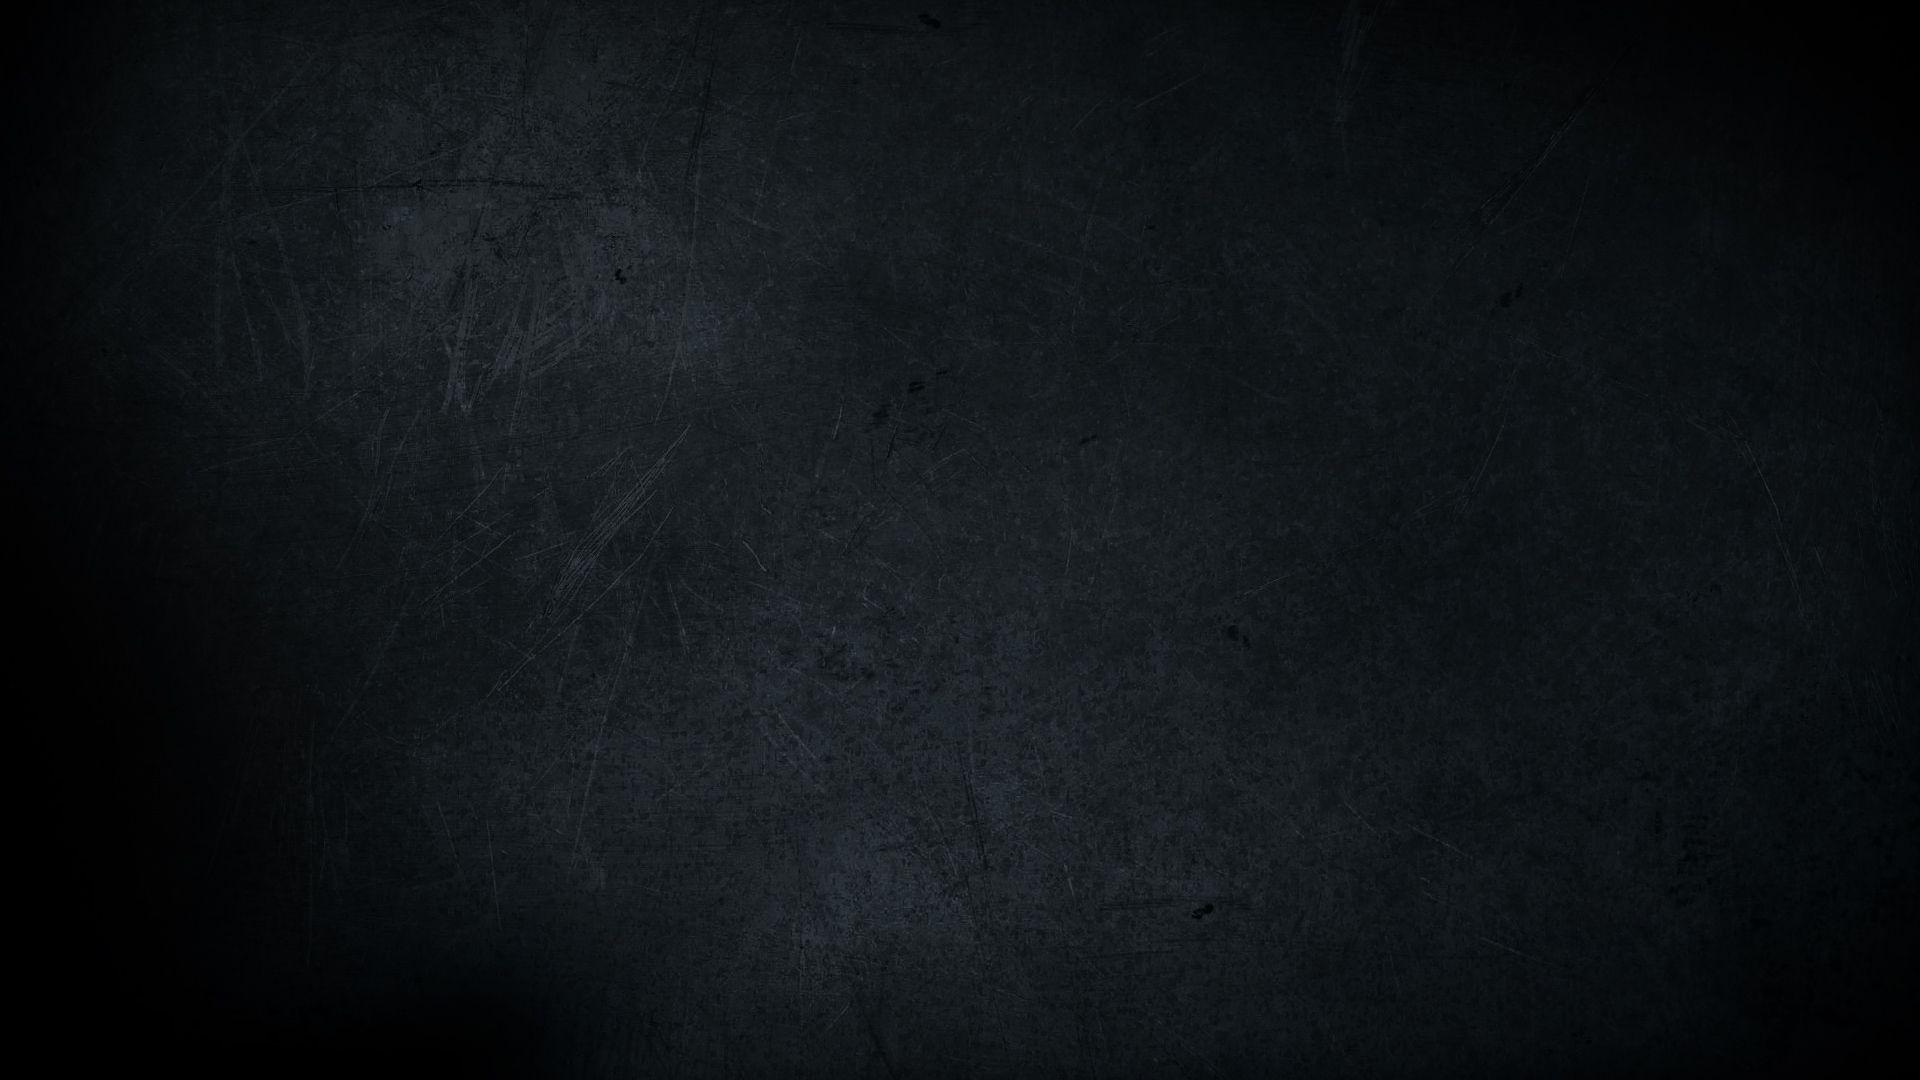 High Resolution Black Background laptop background wallpaper